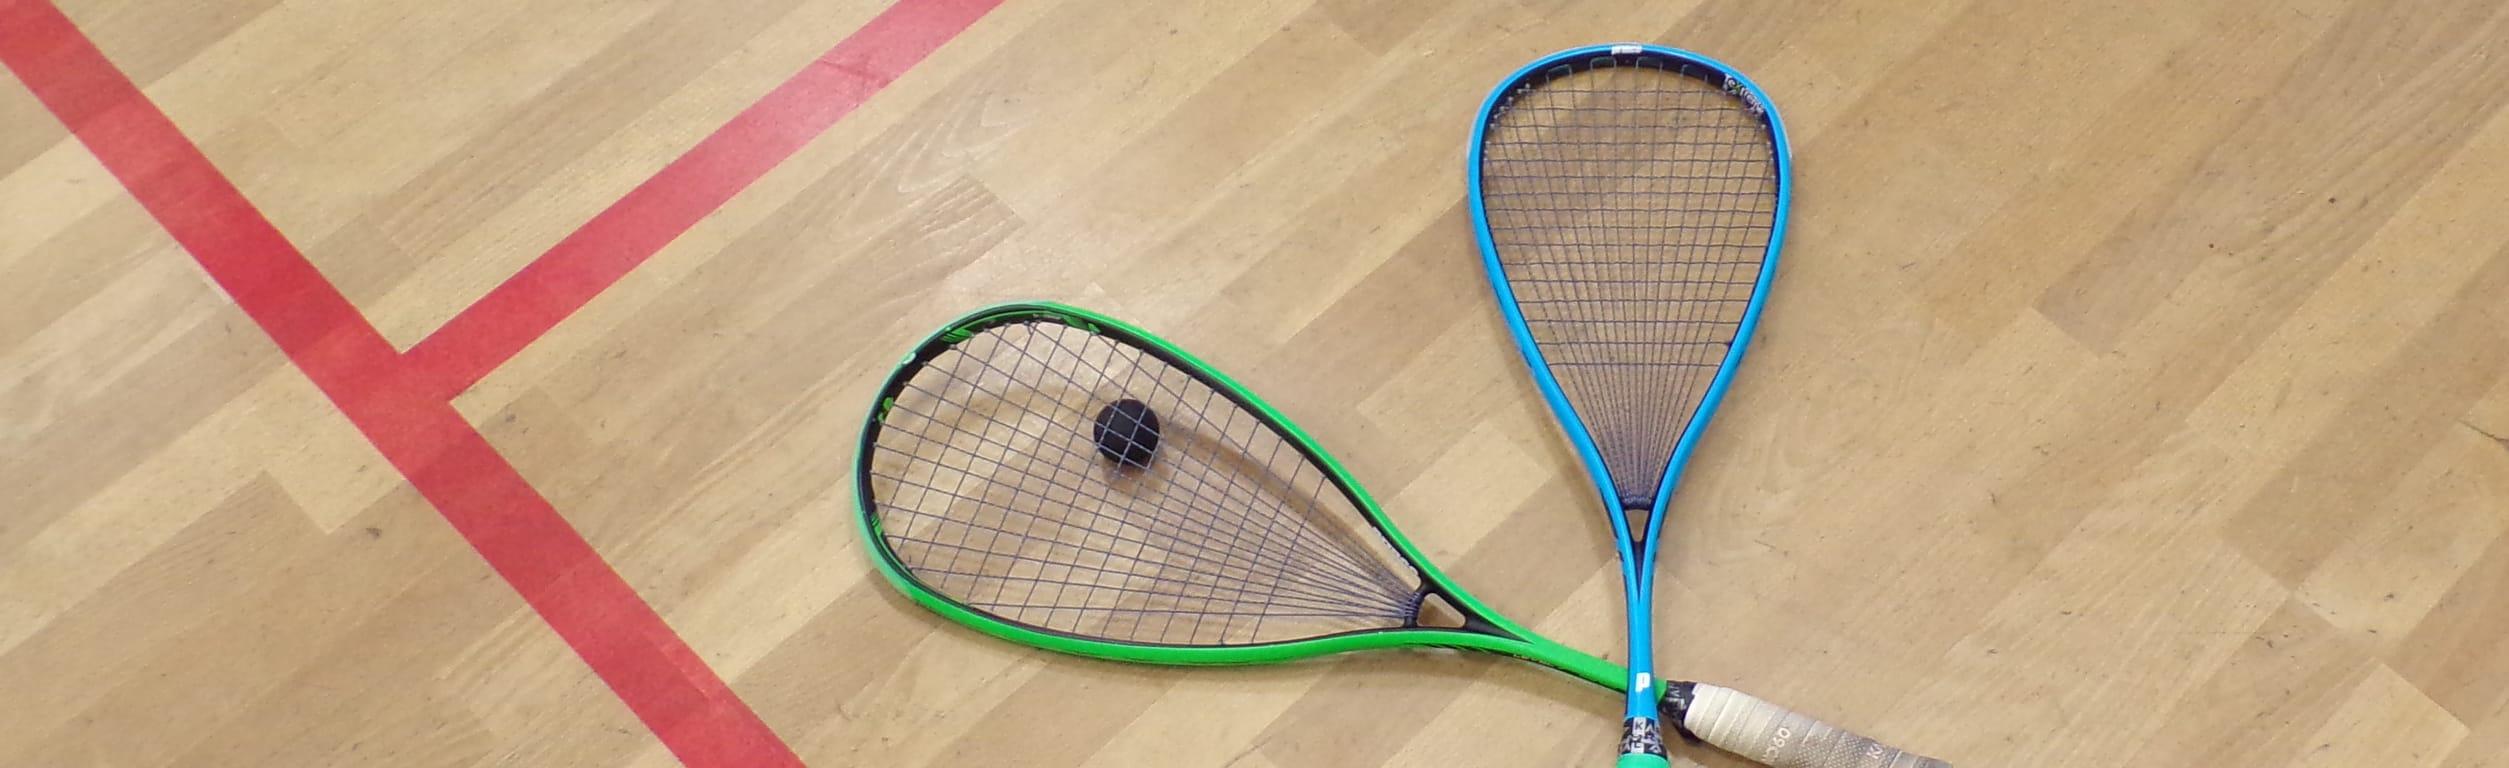 Association Topfit Squash